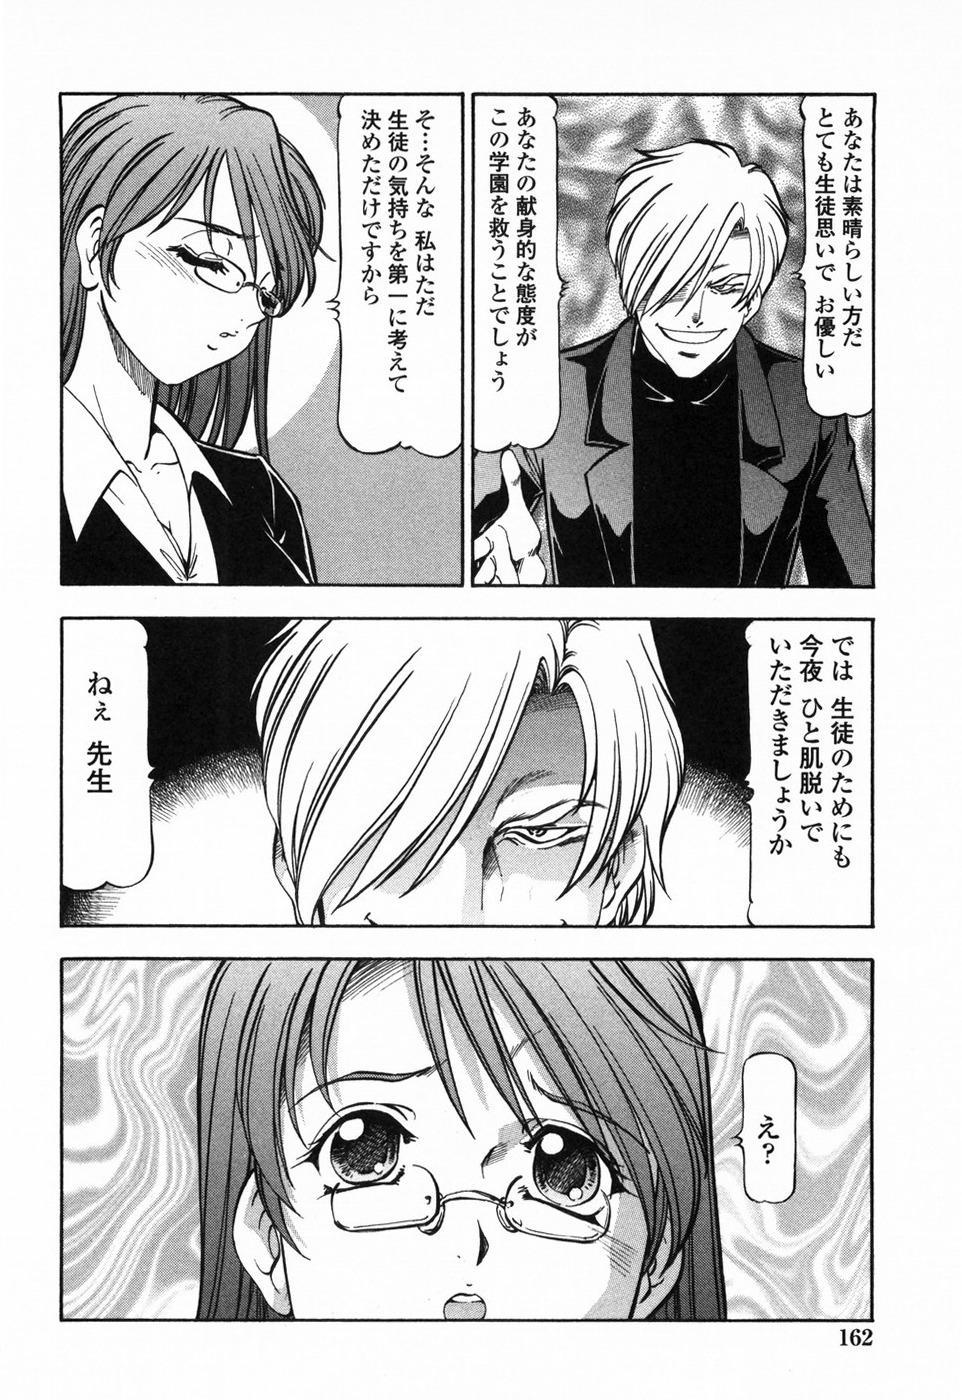 Kichiku Houteishiki - Equation of brutal person 168